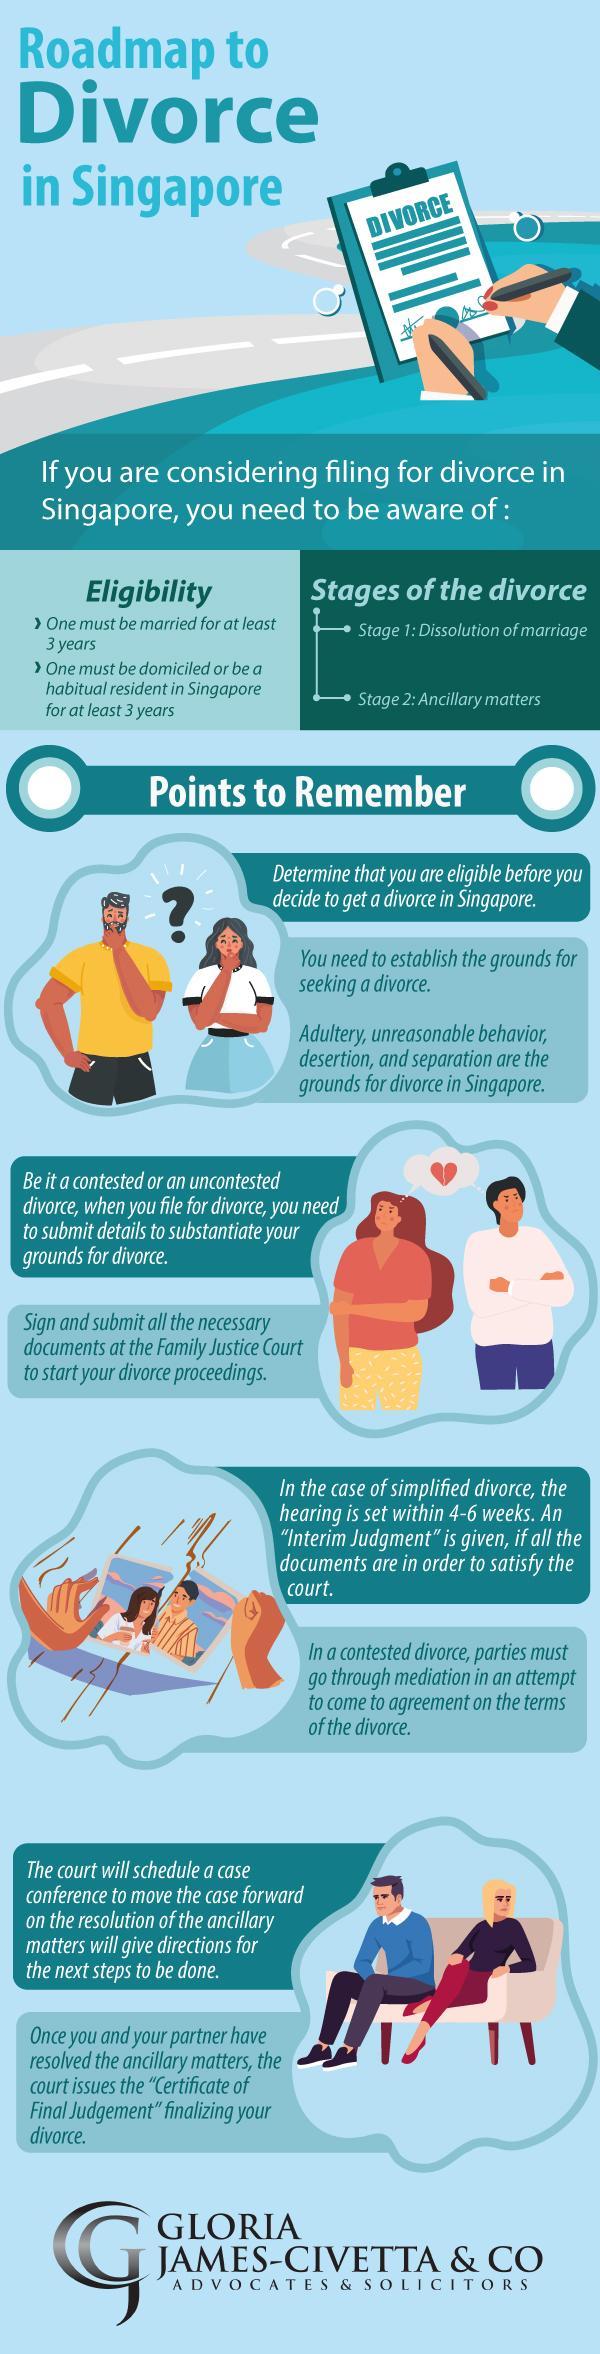 divorce in singapore guide